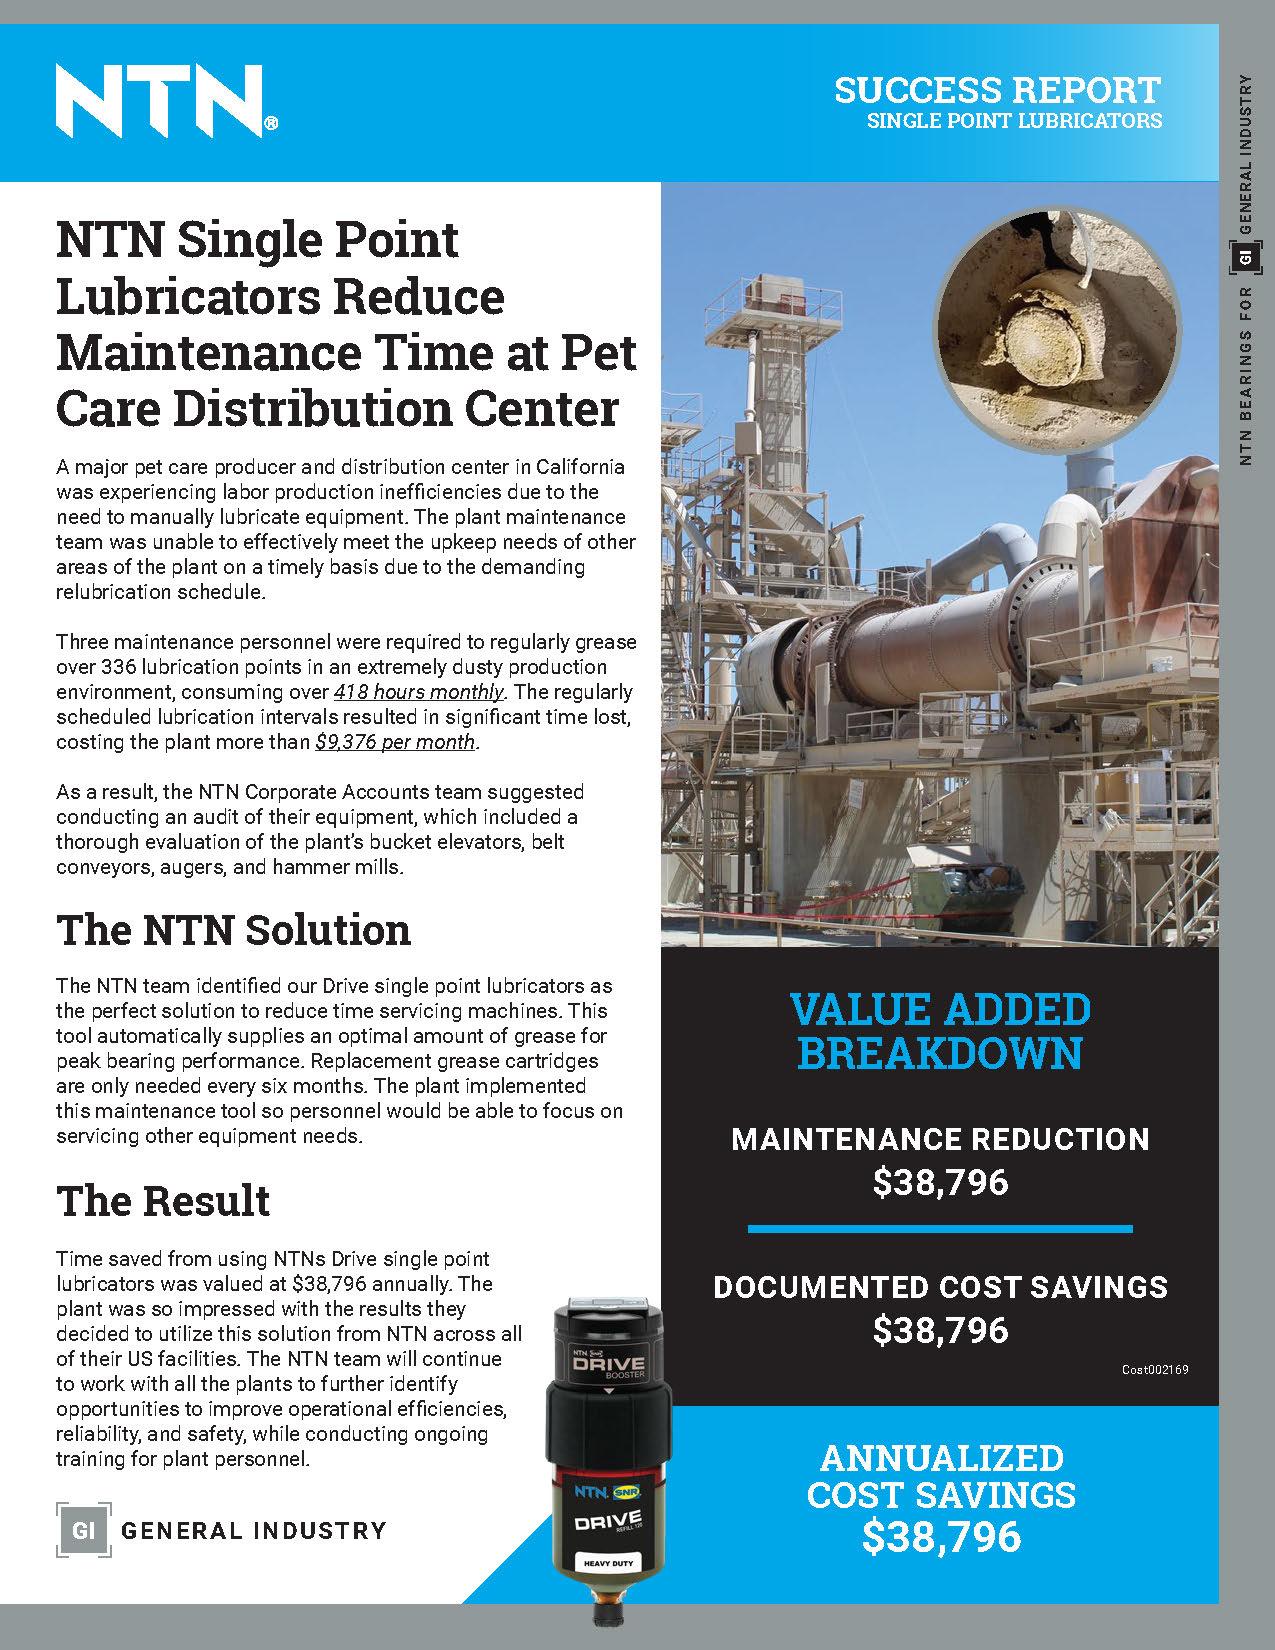 success report single point lubricators cover